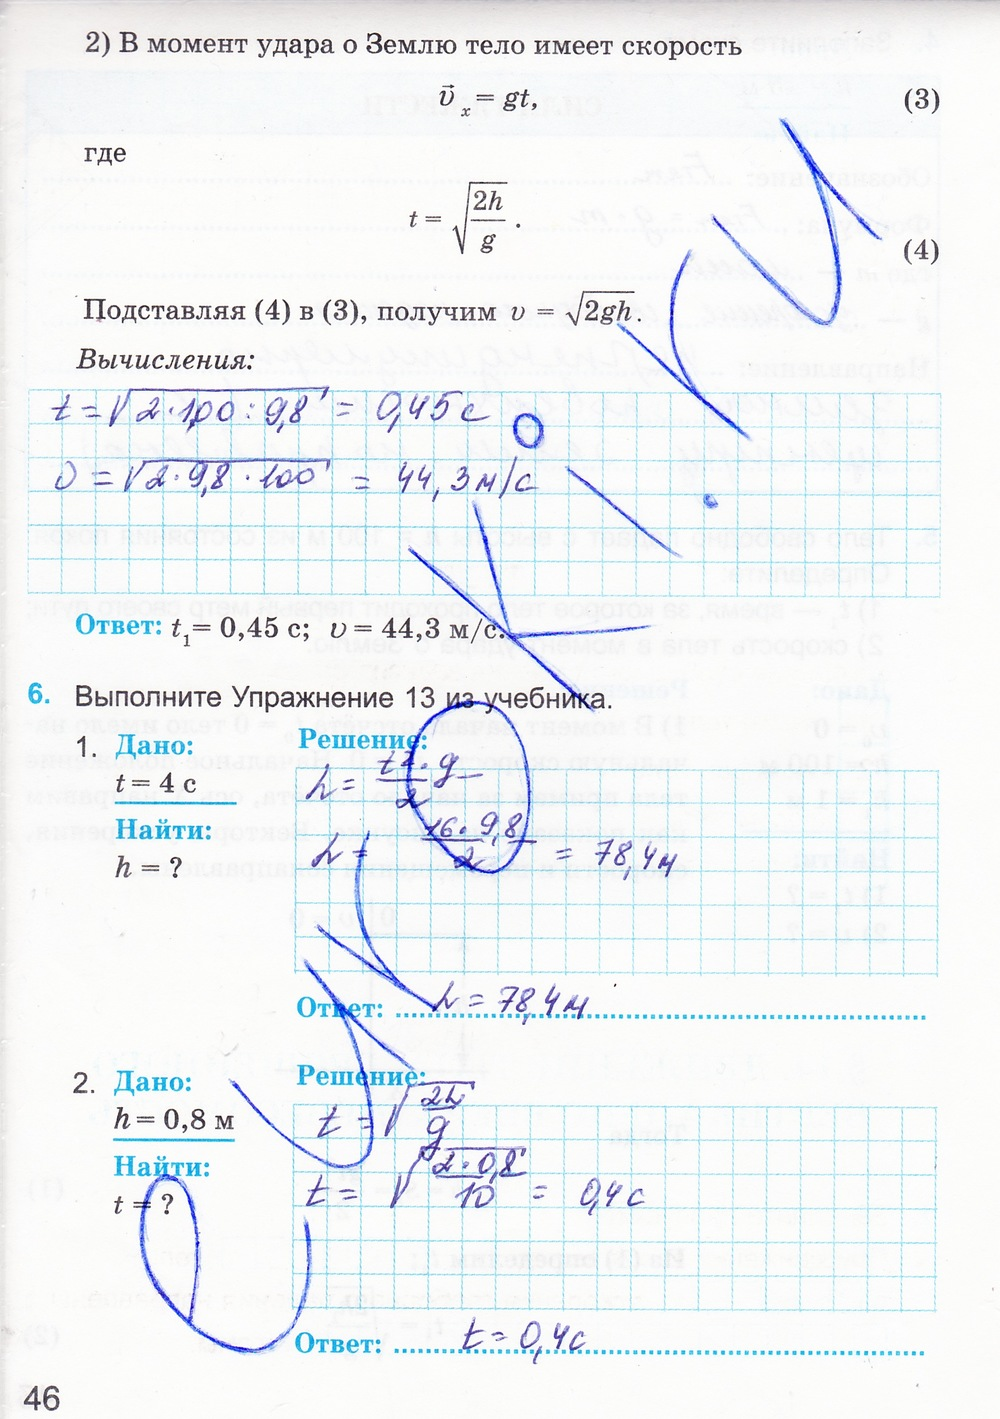 дмитриева гдз класс физике по 9